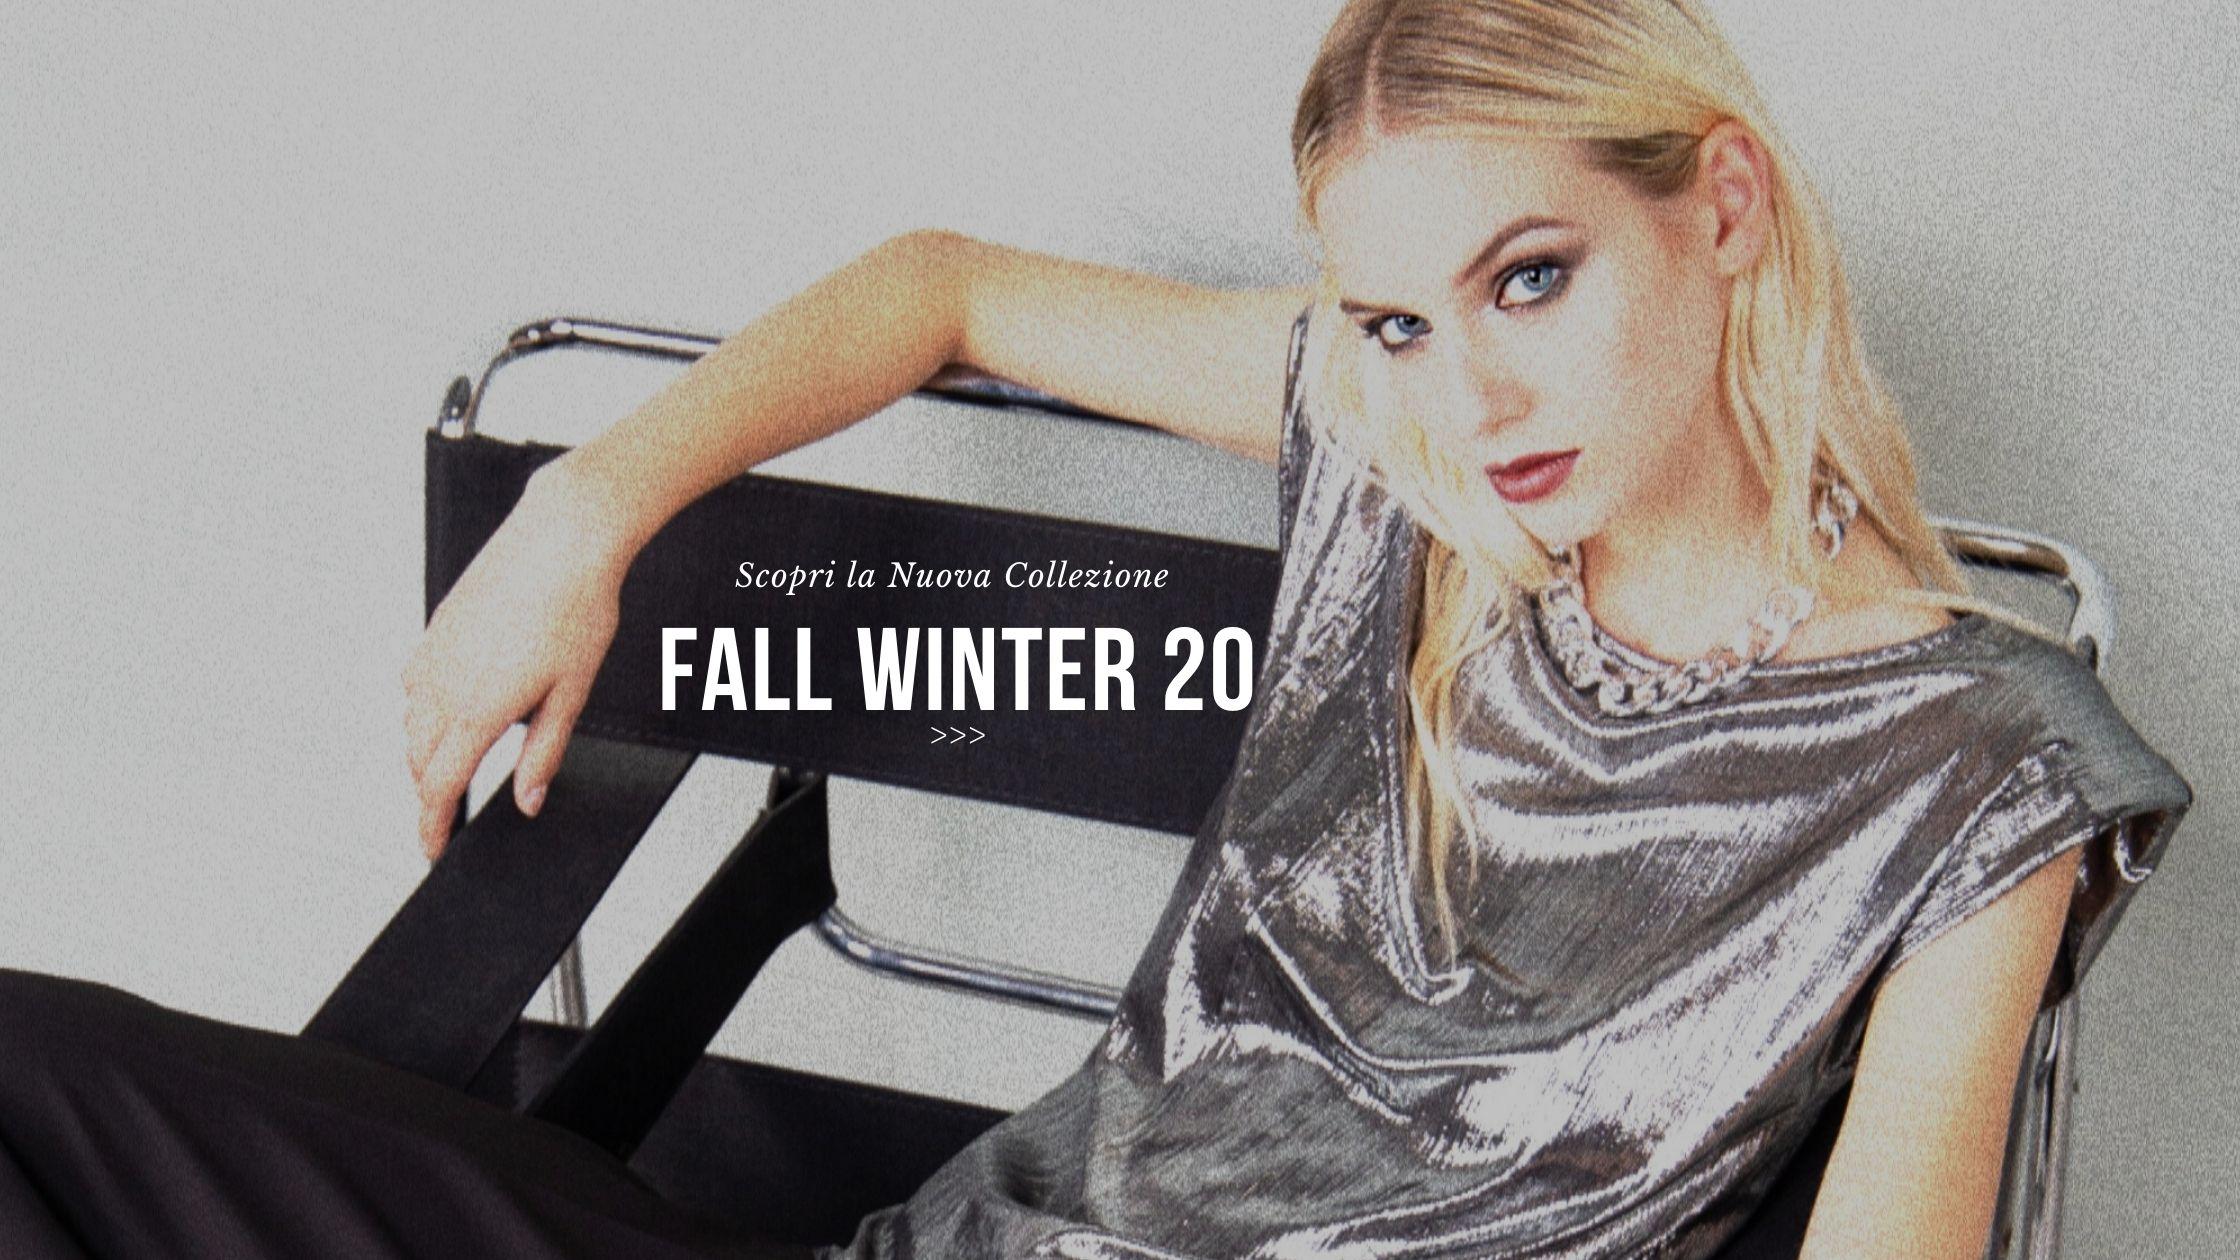 Home Page_Fall winter 20_Futur3 Fashion